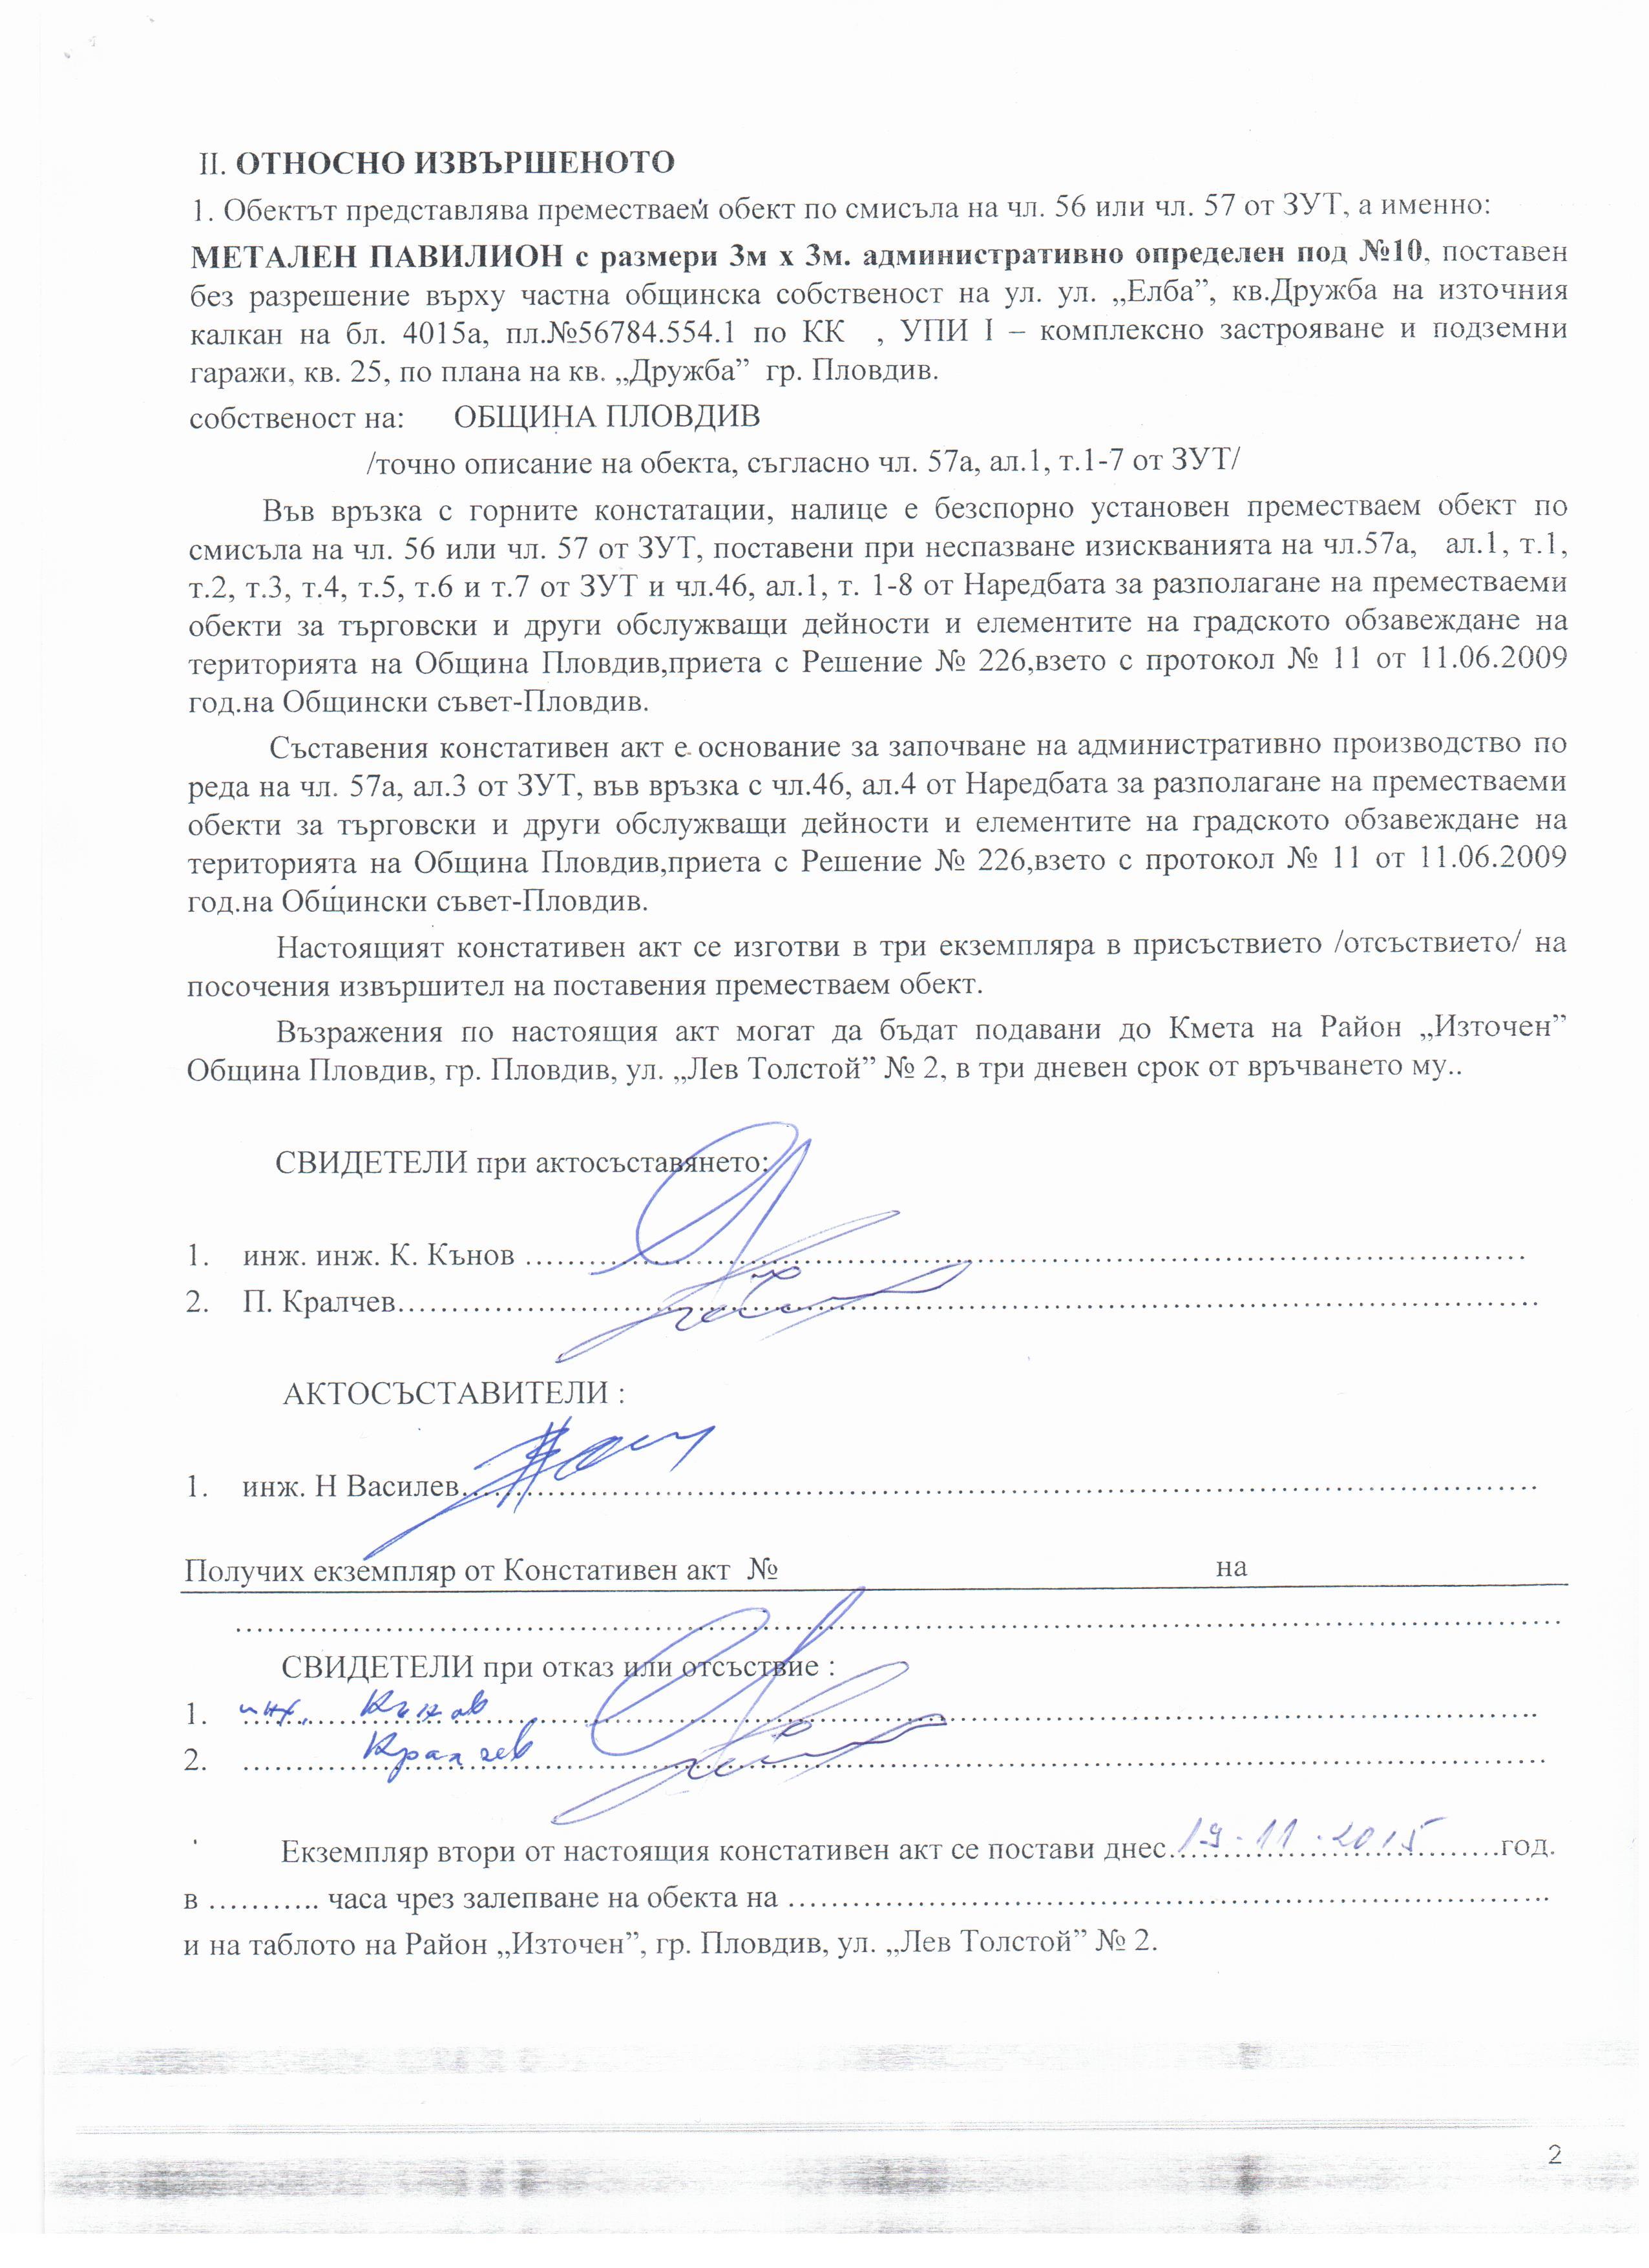 KONSTATIVEN_AKT_№85_1